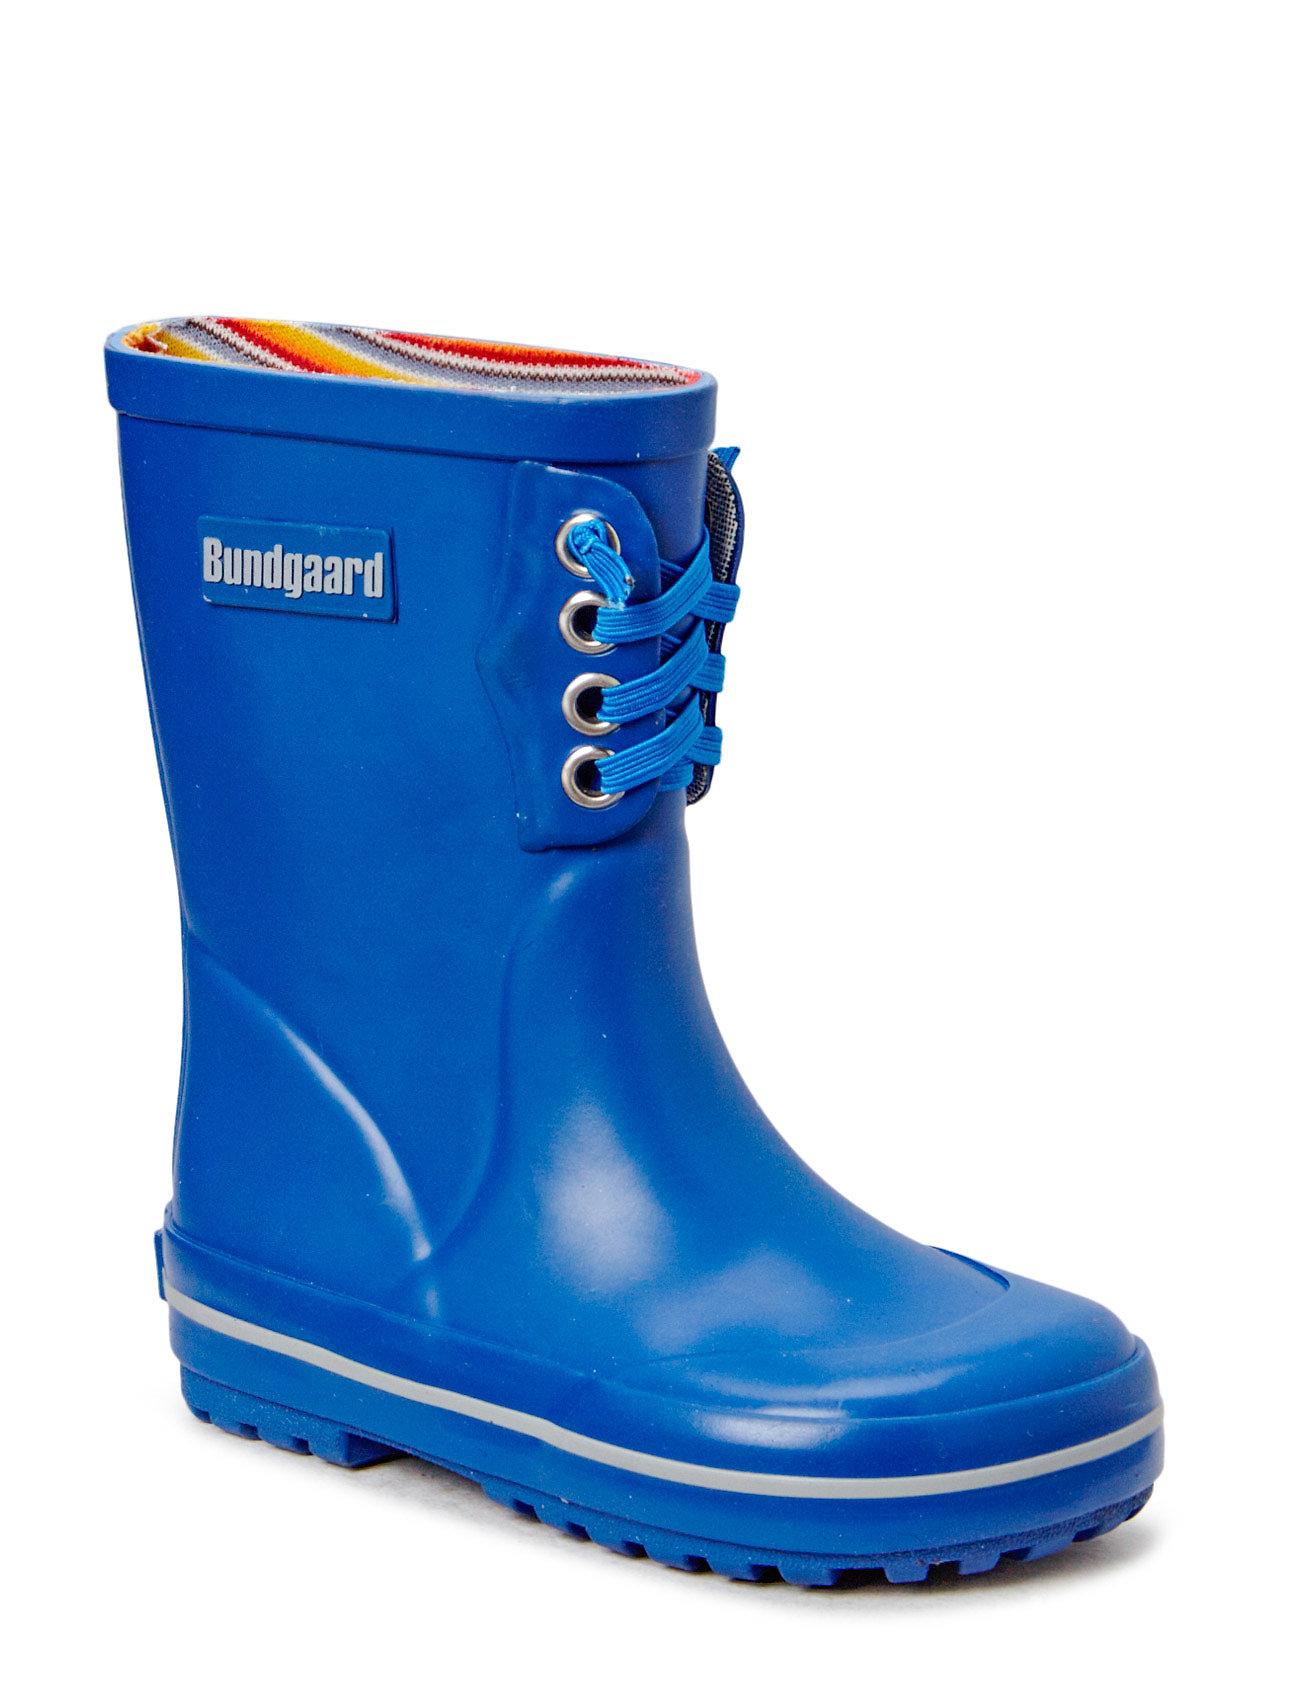 Bundgaard Classic Rubber Boot Brght Blue